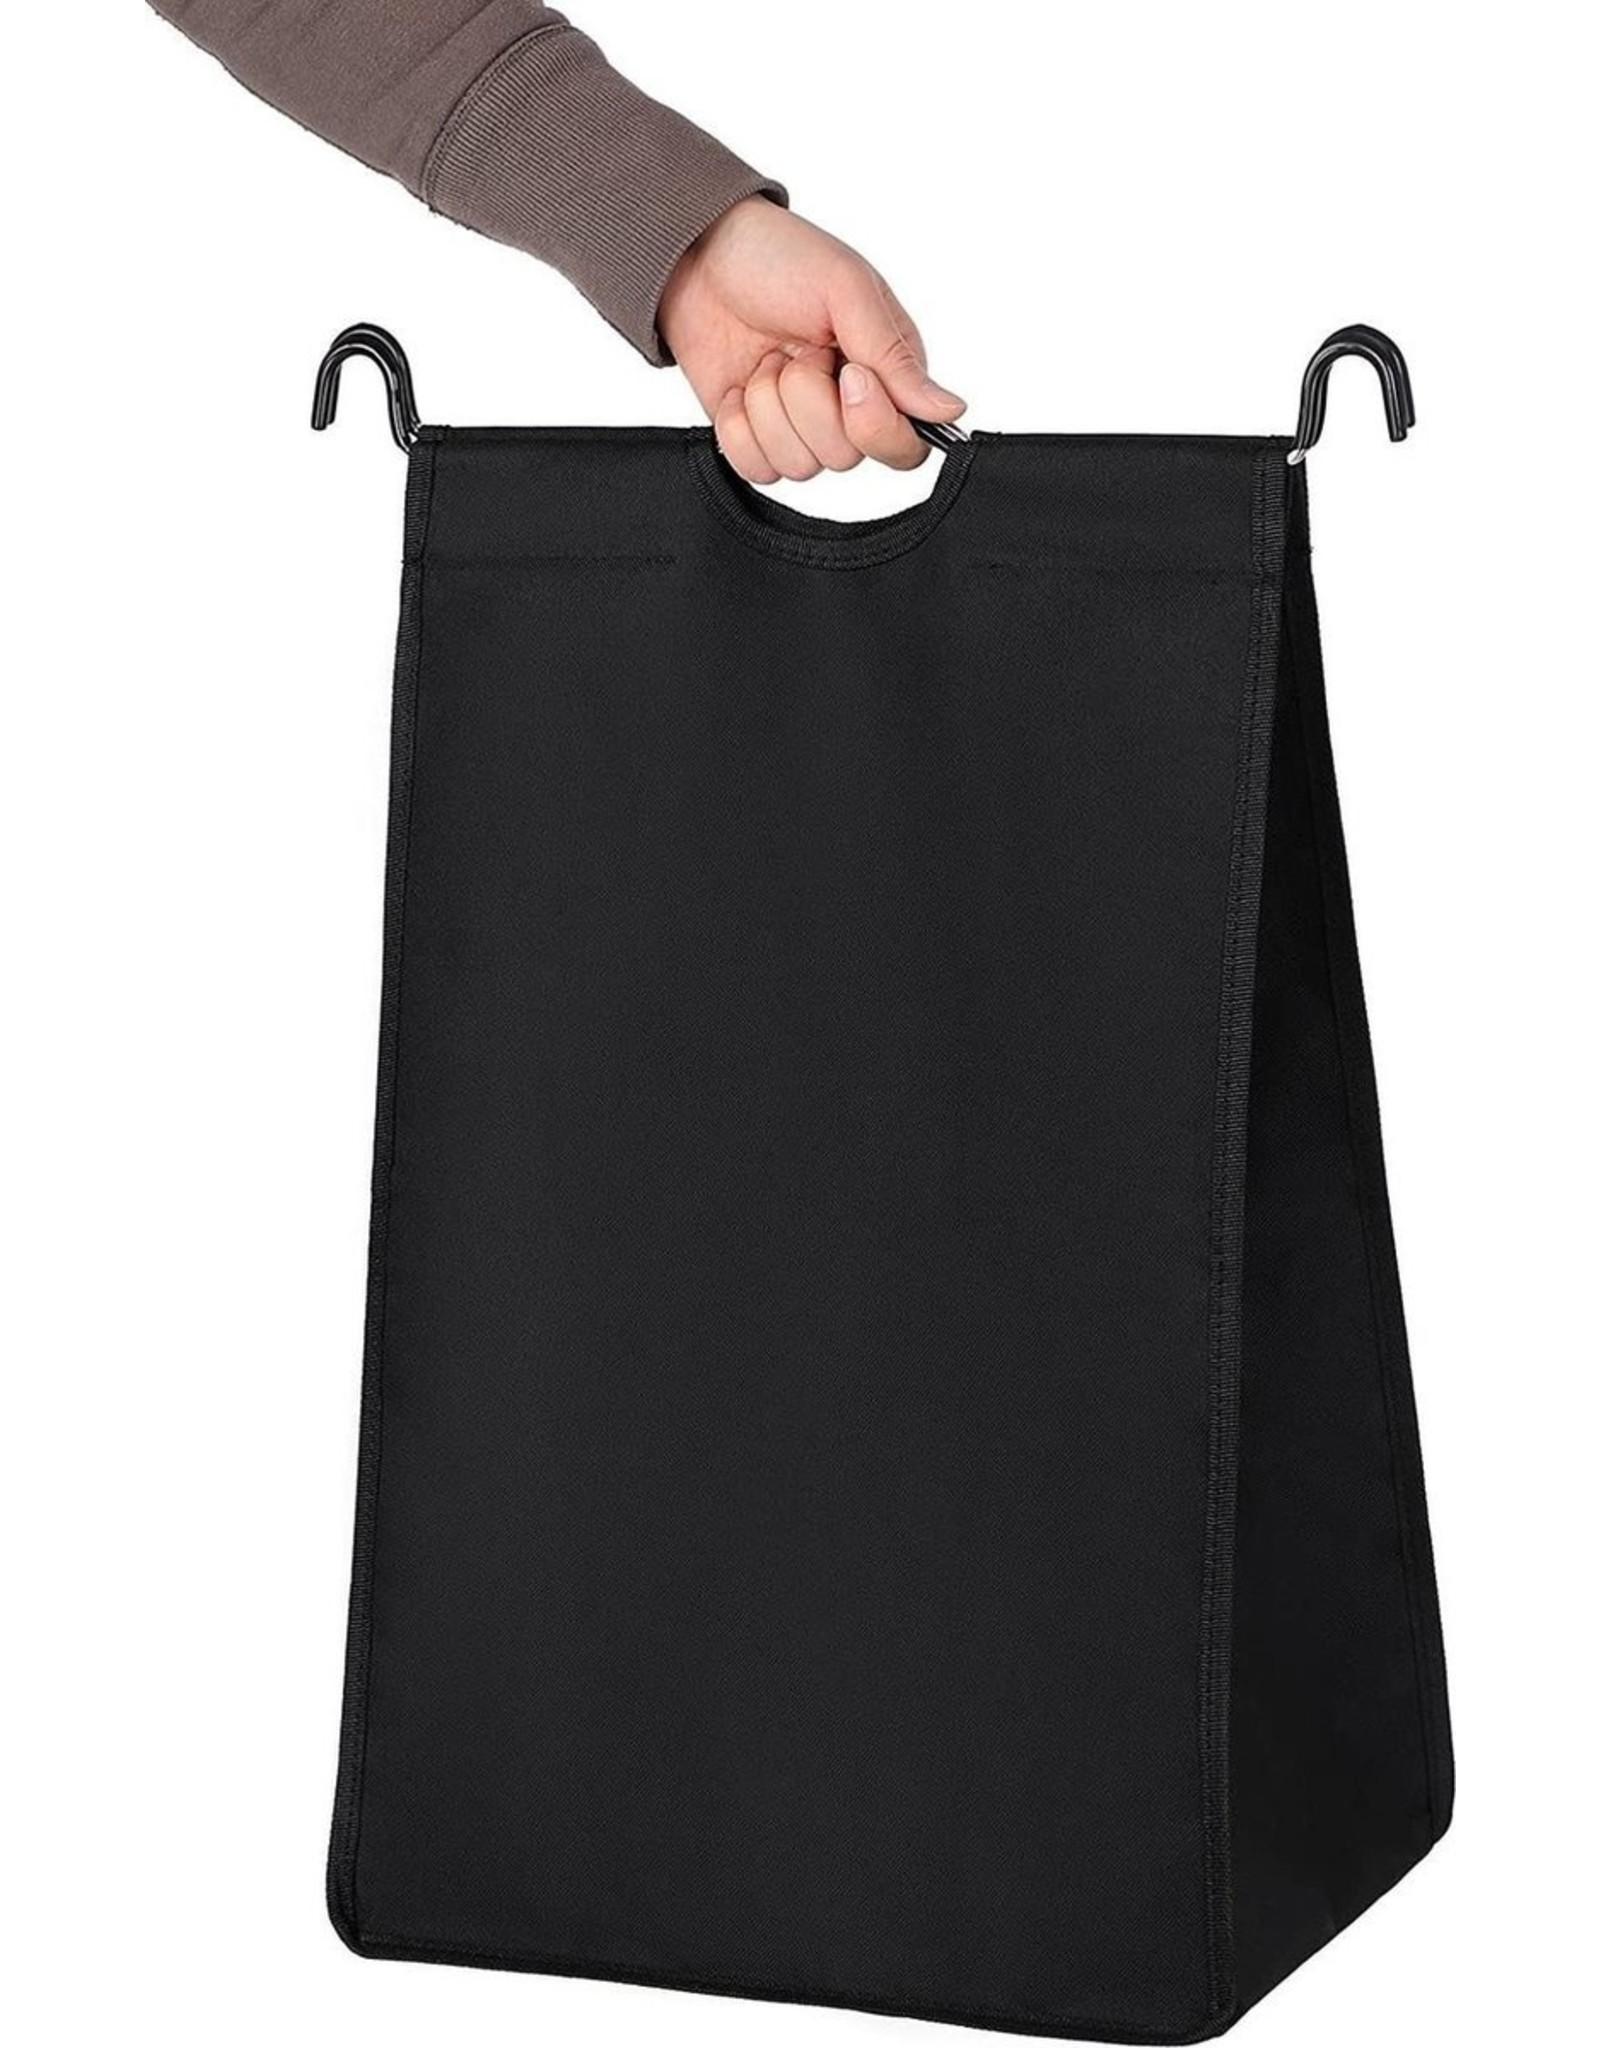 Parya Home Parya Home - Verrijdbare Wasmand - Inclusief 3 afneembare stoffen zakken - Zwart